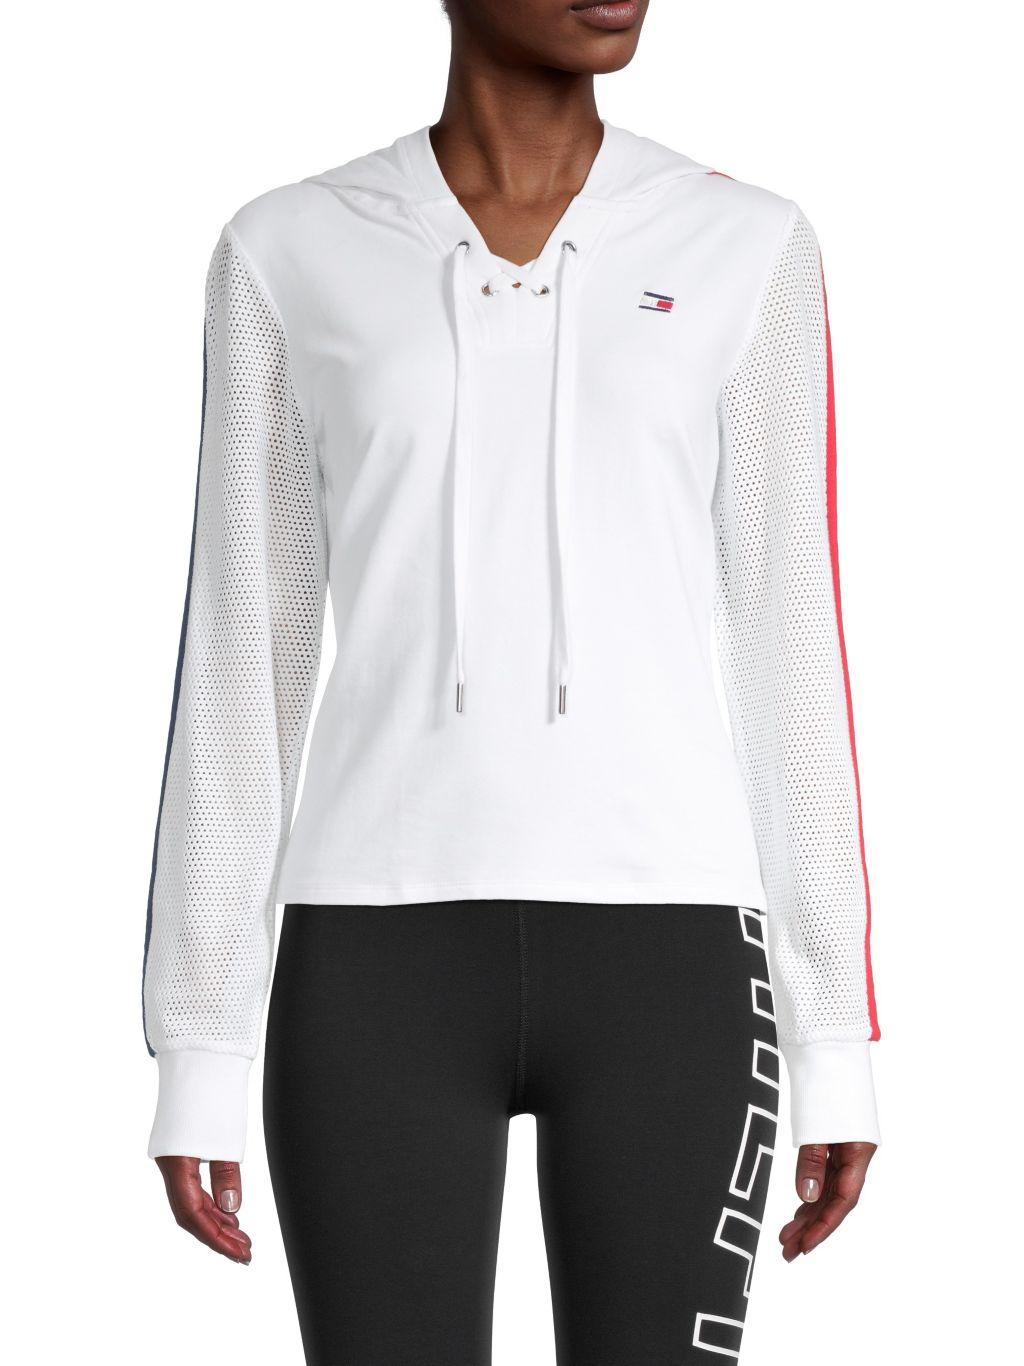 Tommy Hilfiger Sport Spring Mesh Hooded Sweatshirt